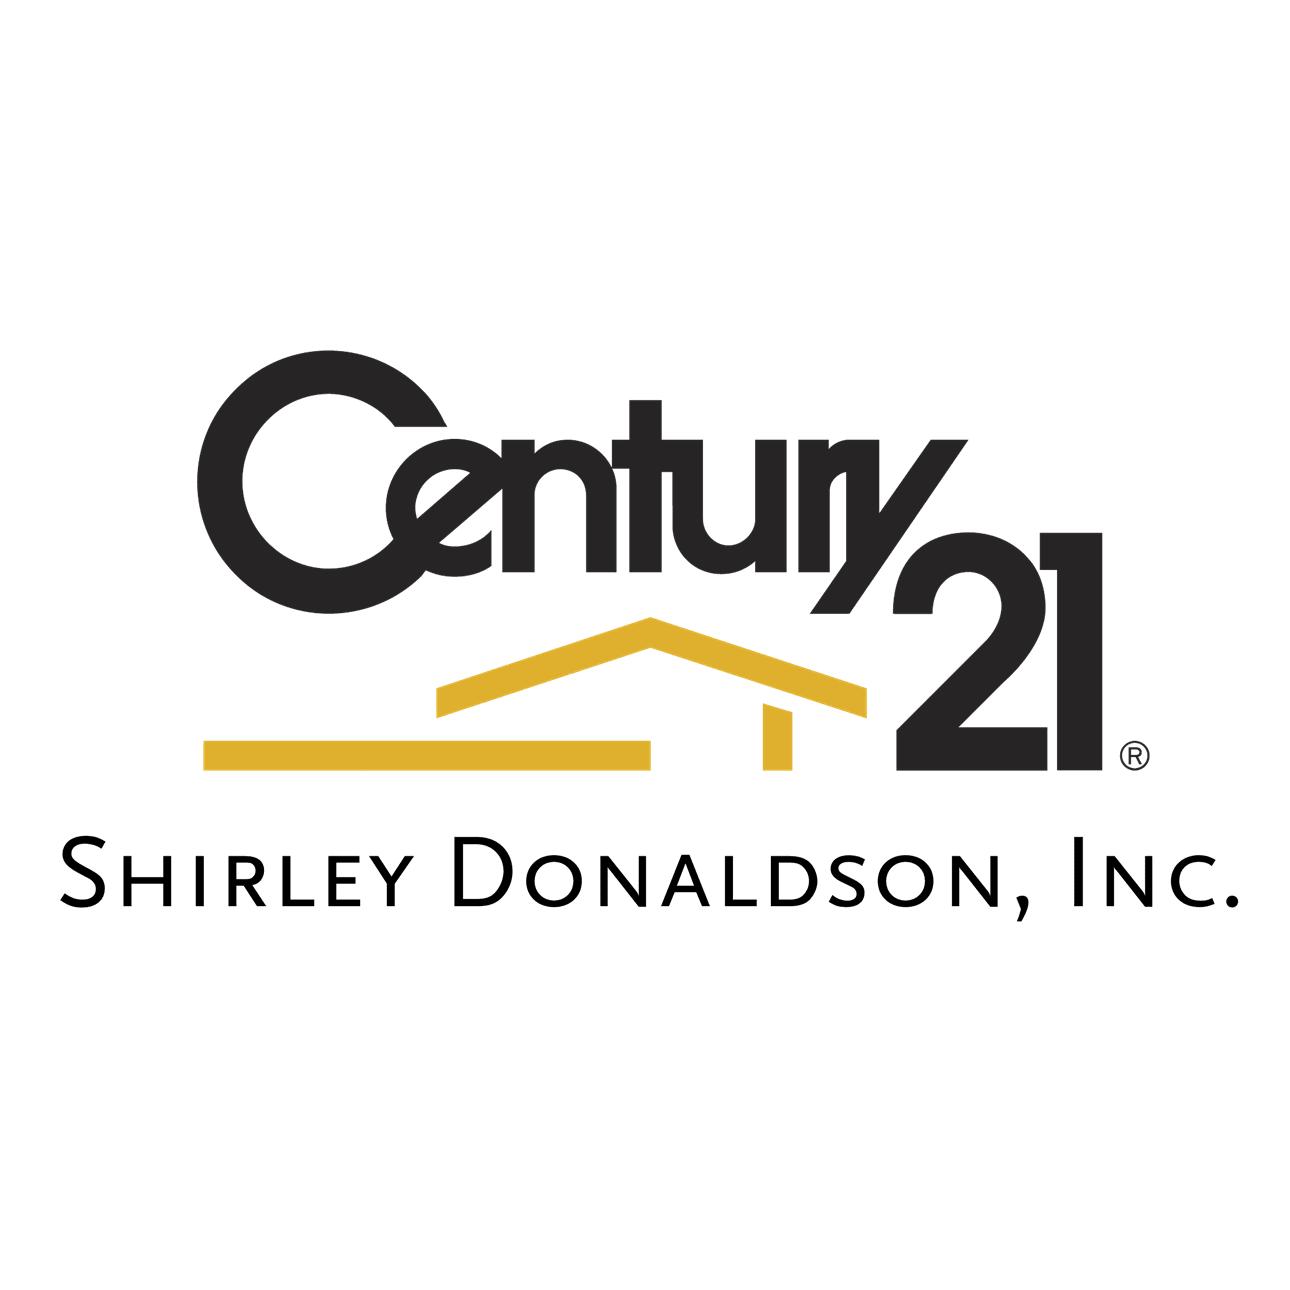 Century 21 Shirley Donaldson, Inc